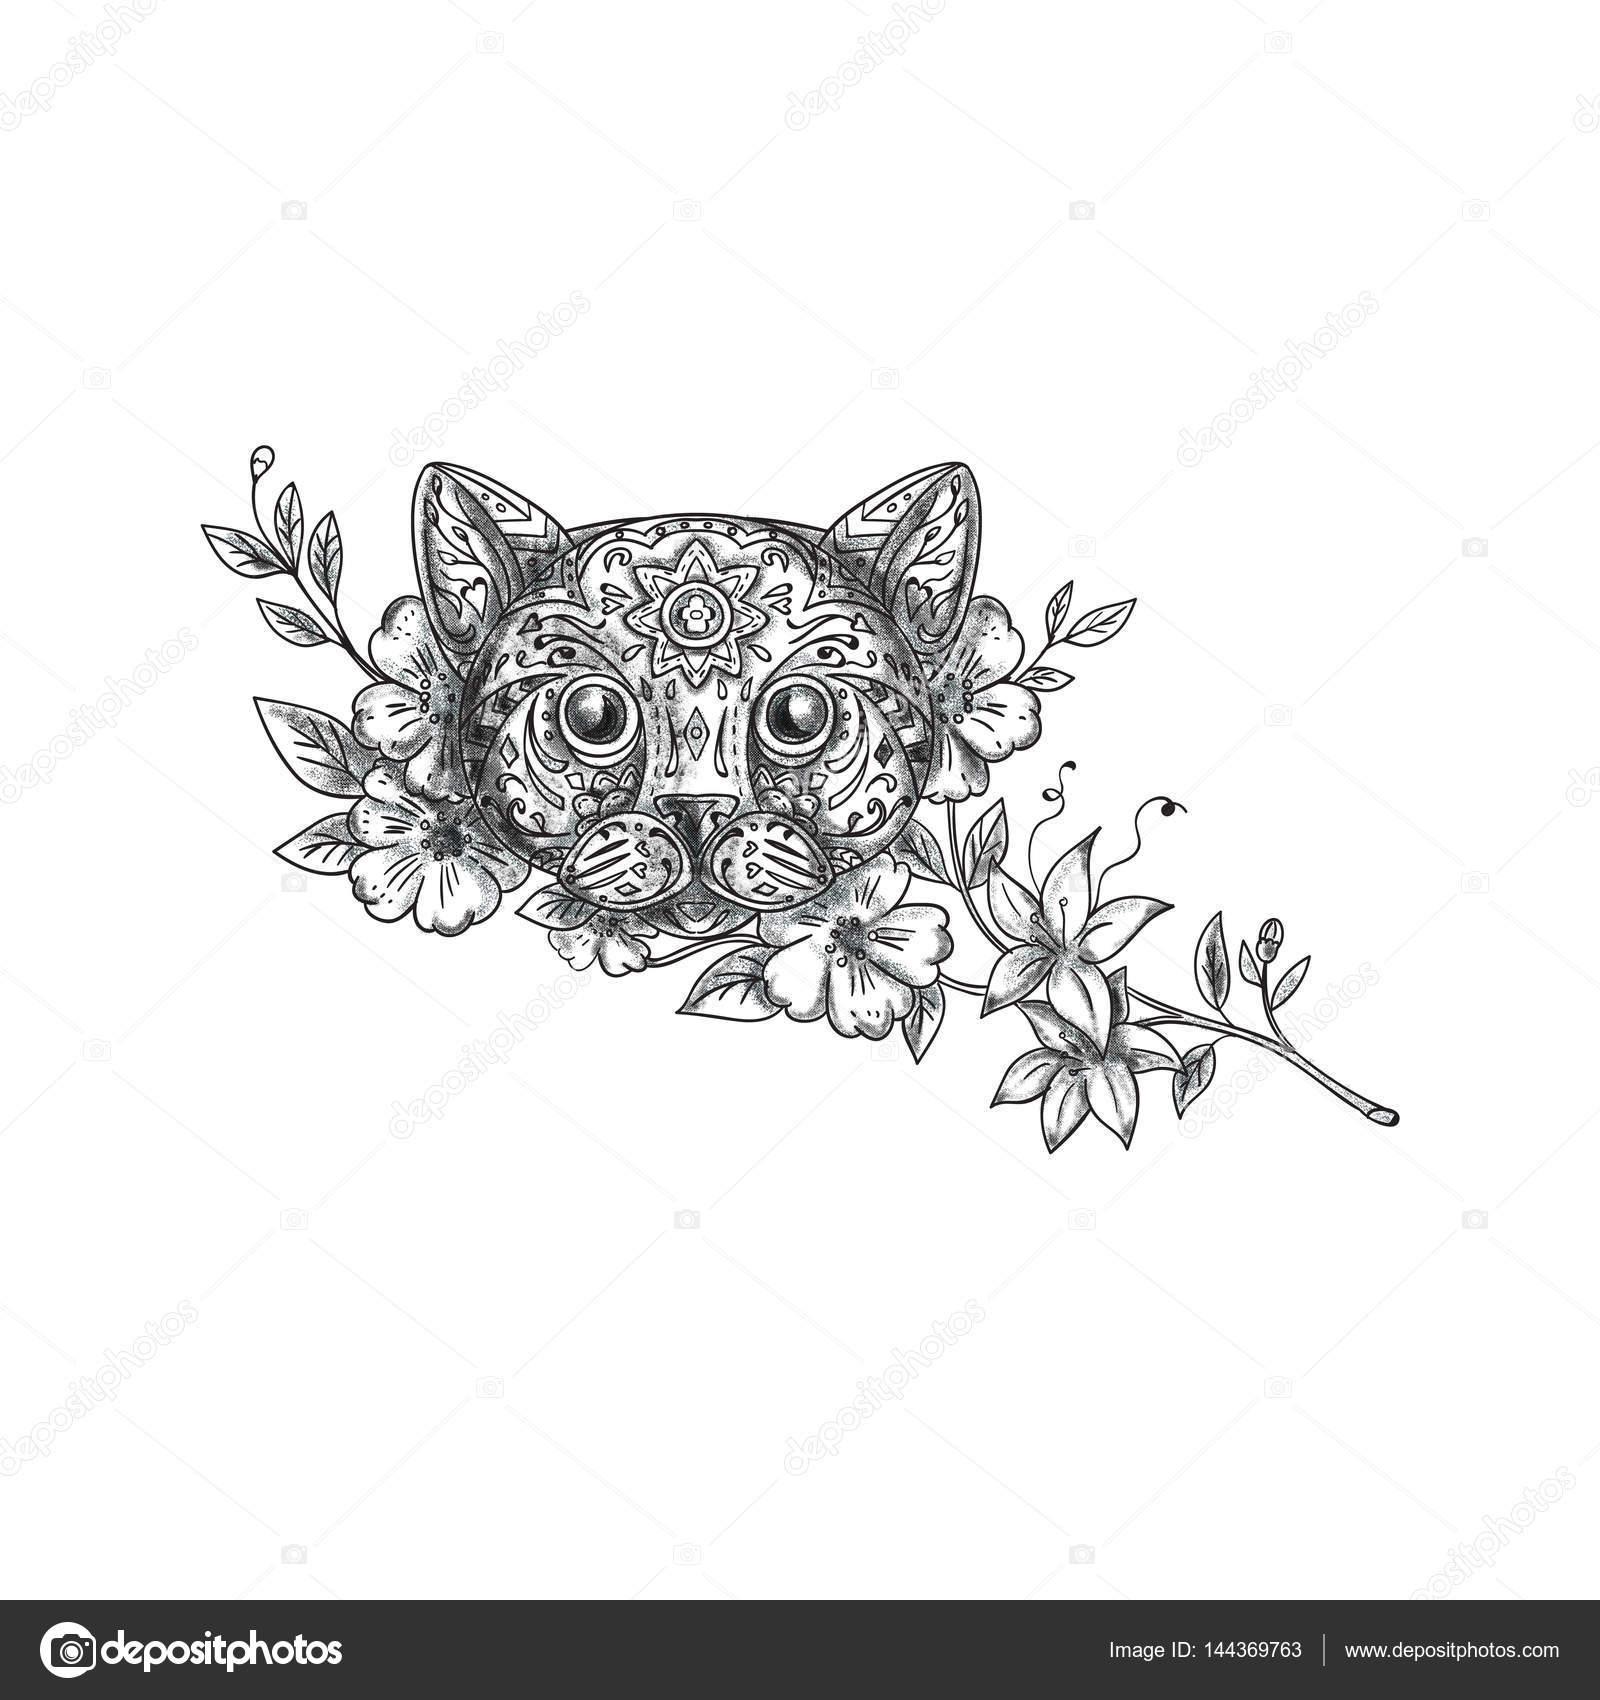 Cat head jasmine flower tattoo stock photo patrimonio 144369763 cat head jasmine flower tattoo stock photo izmirmasajfo